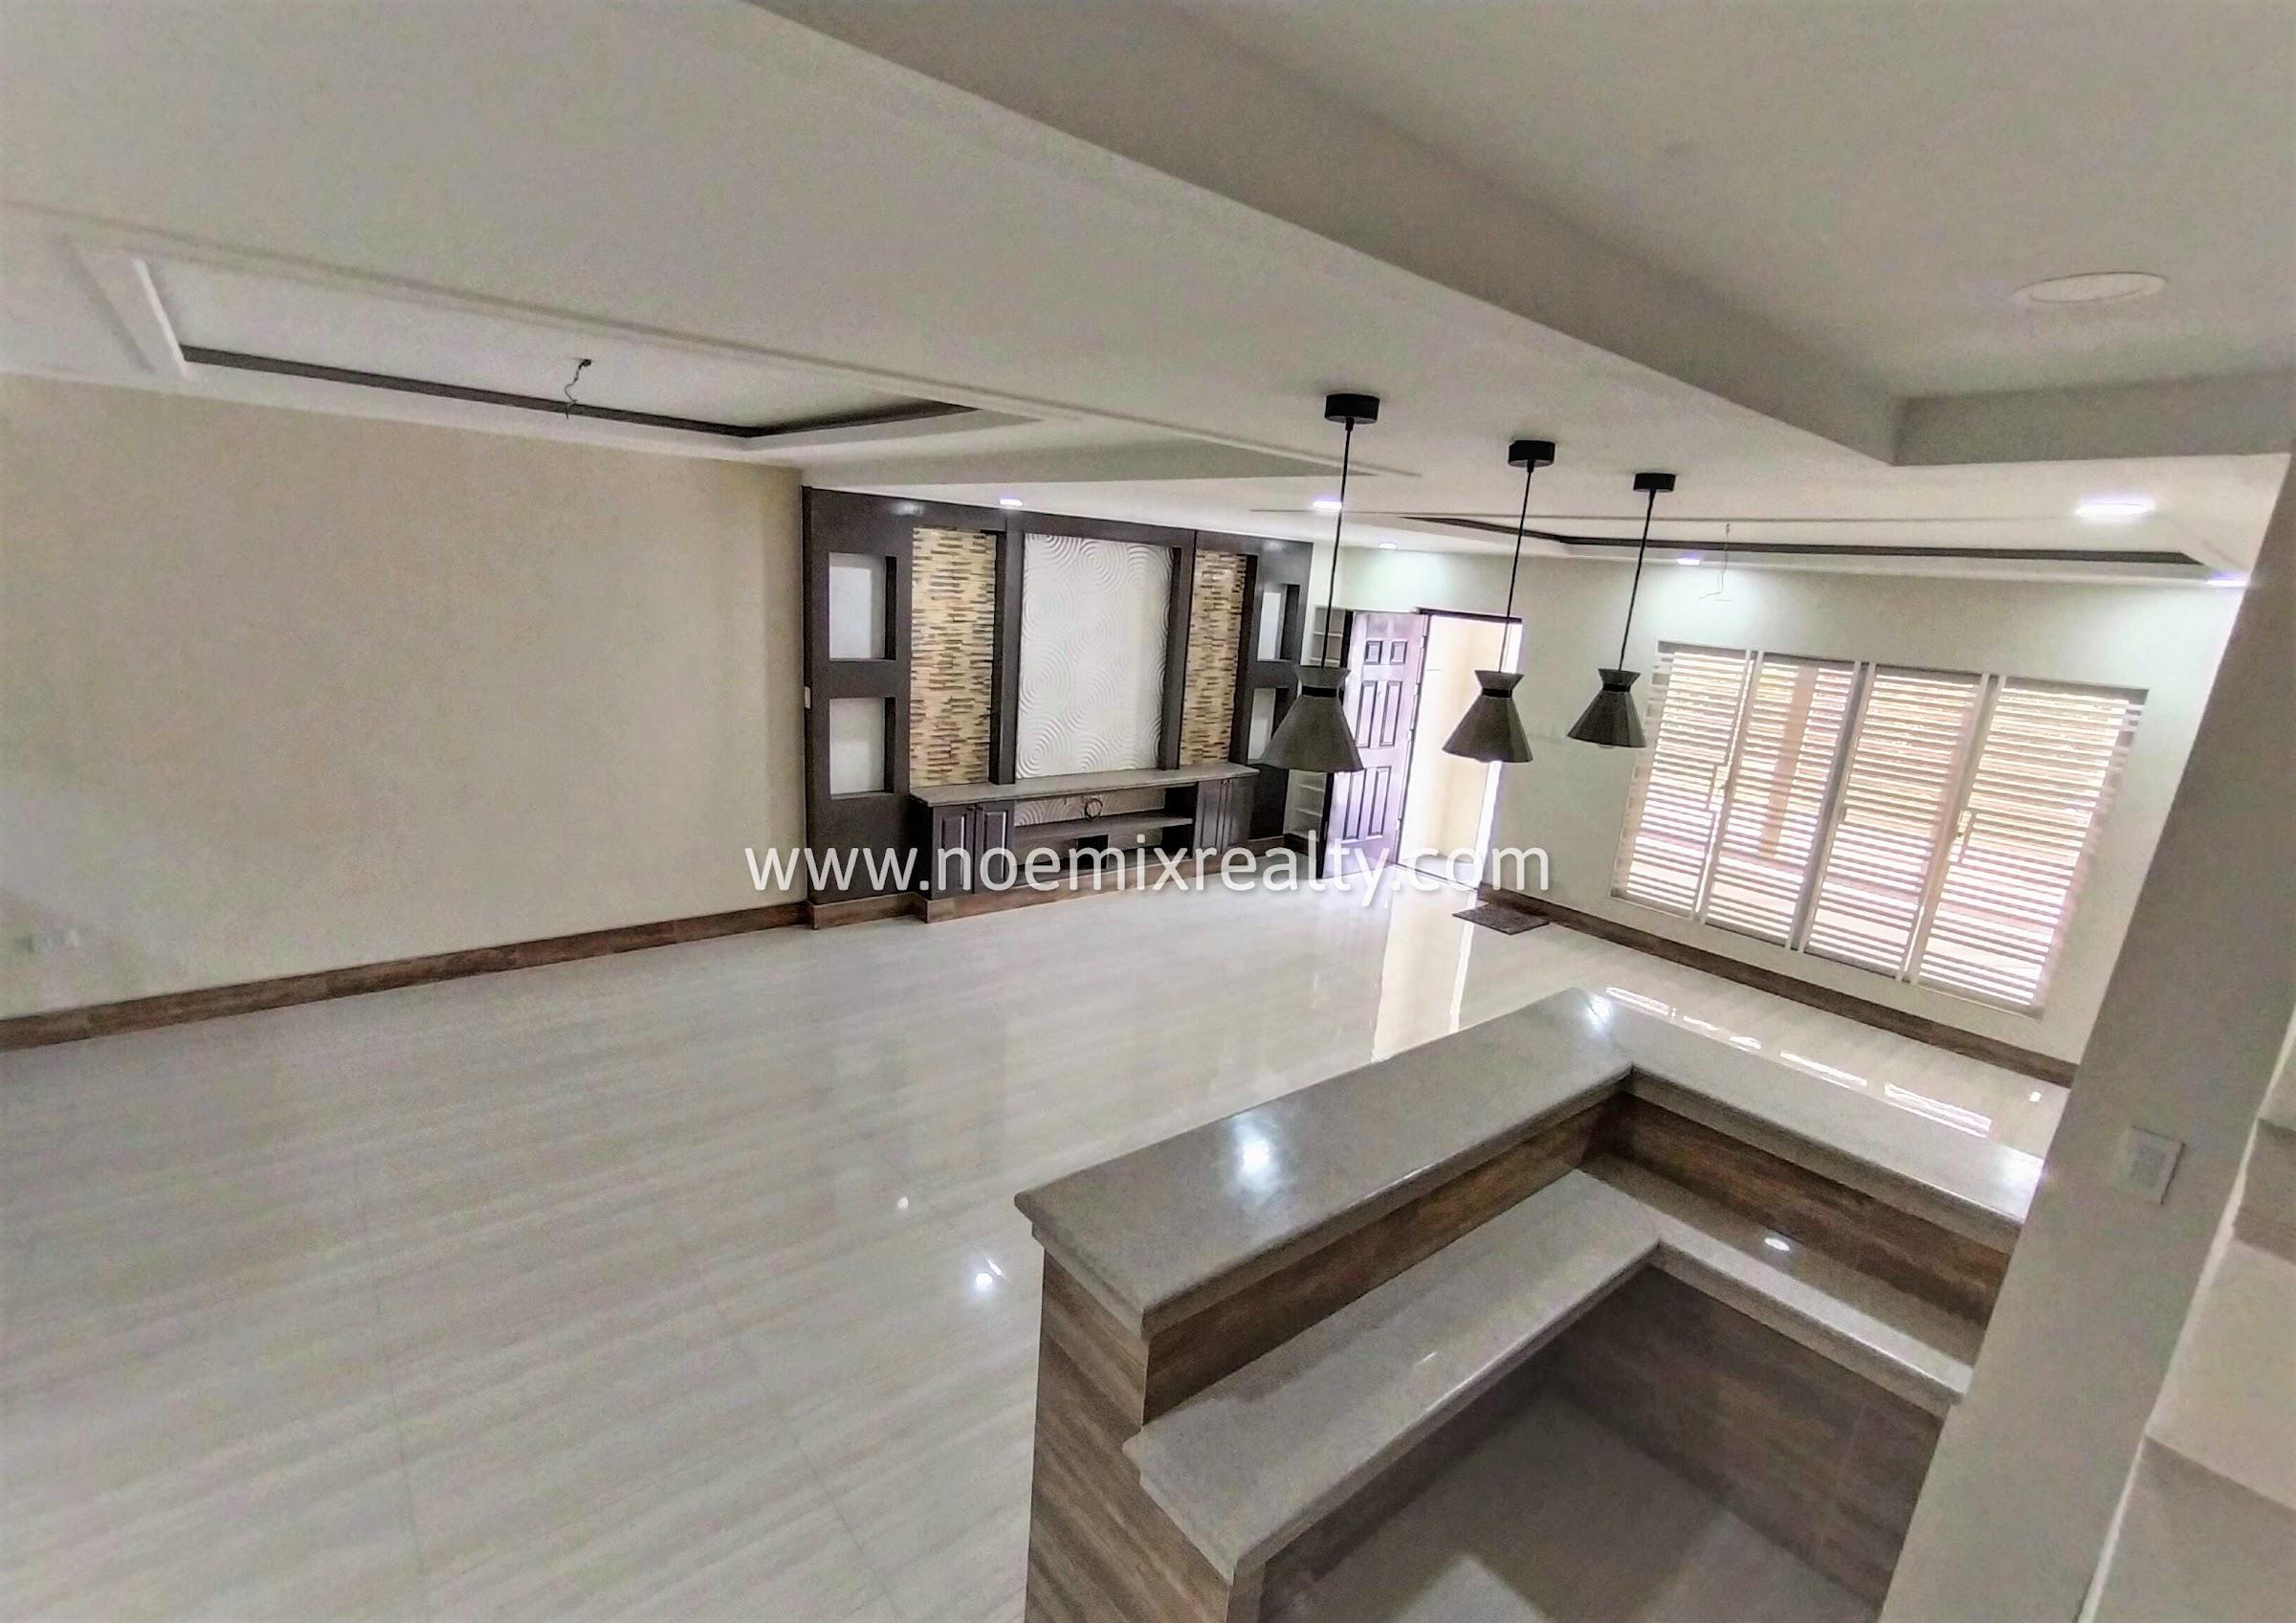 8 Bedroom Townhouse in Tandang Sora, Mindanao Avenue, Quezon City living area